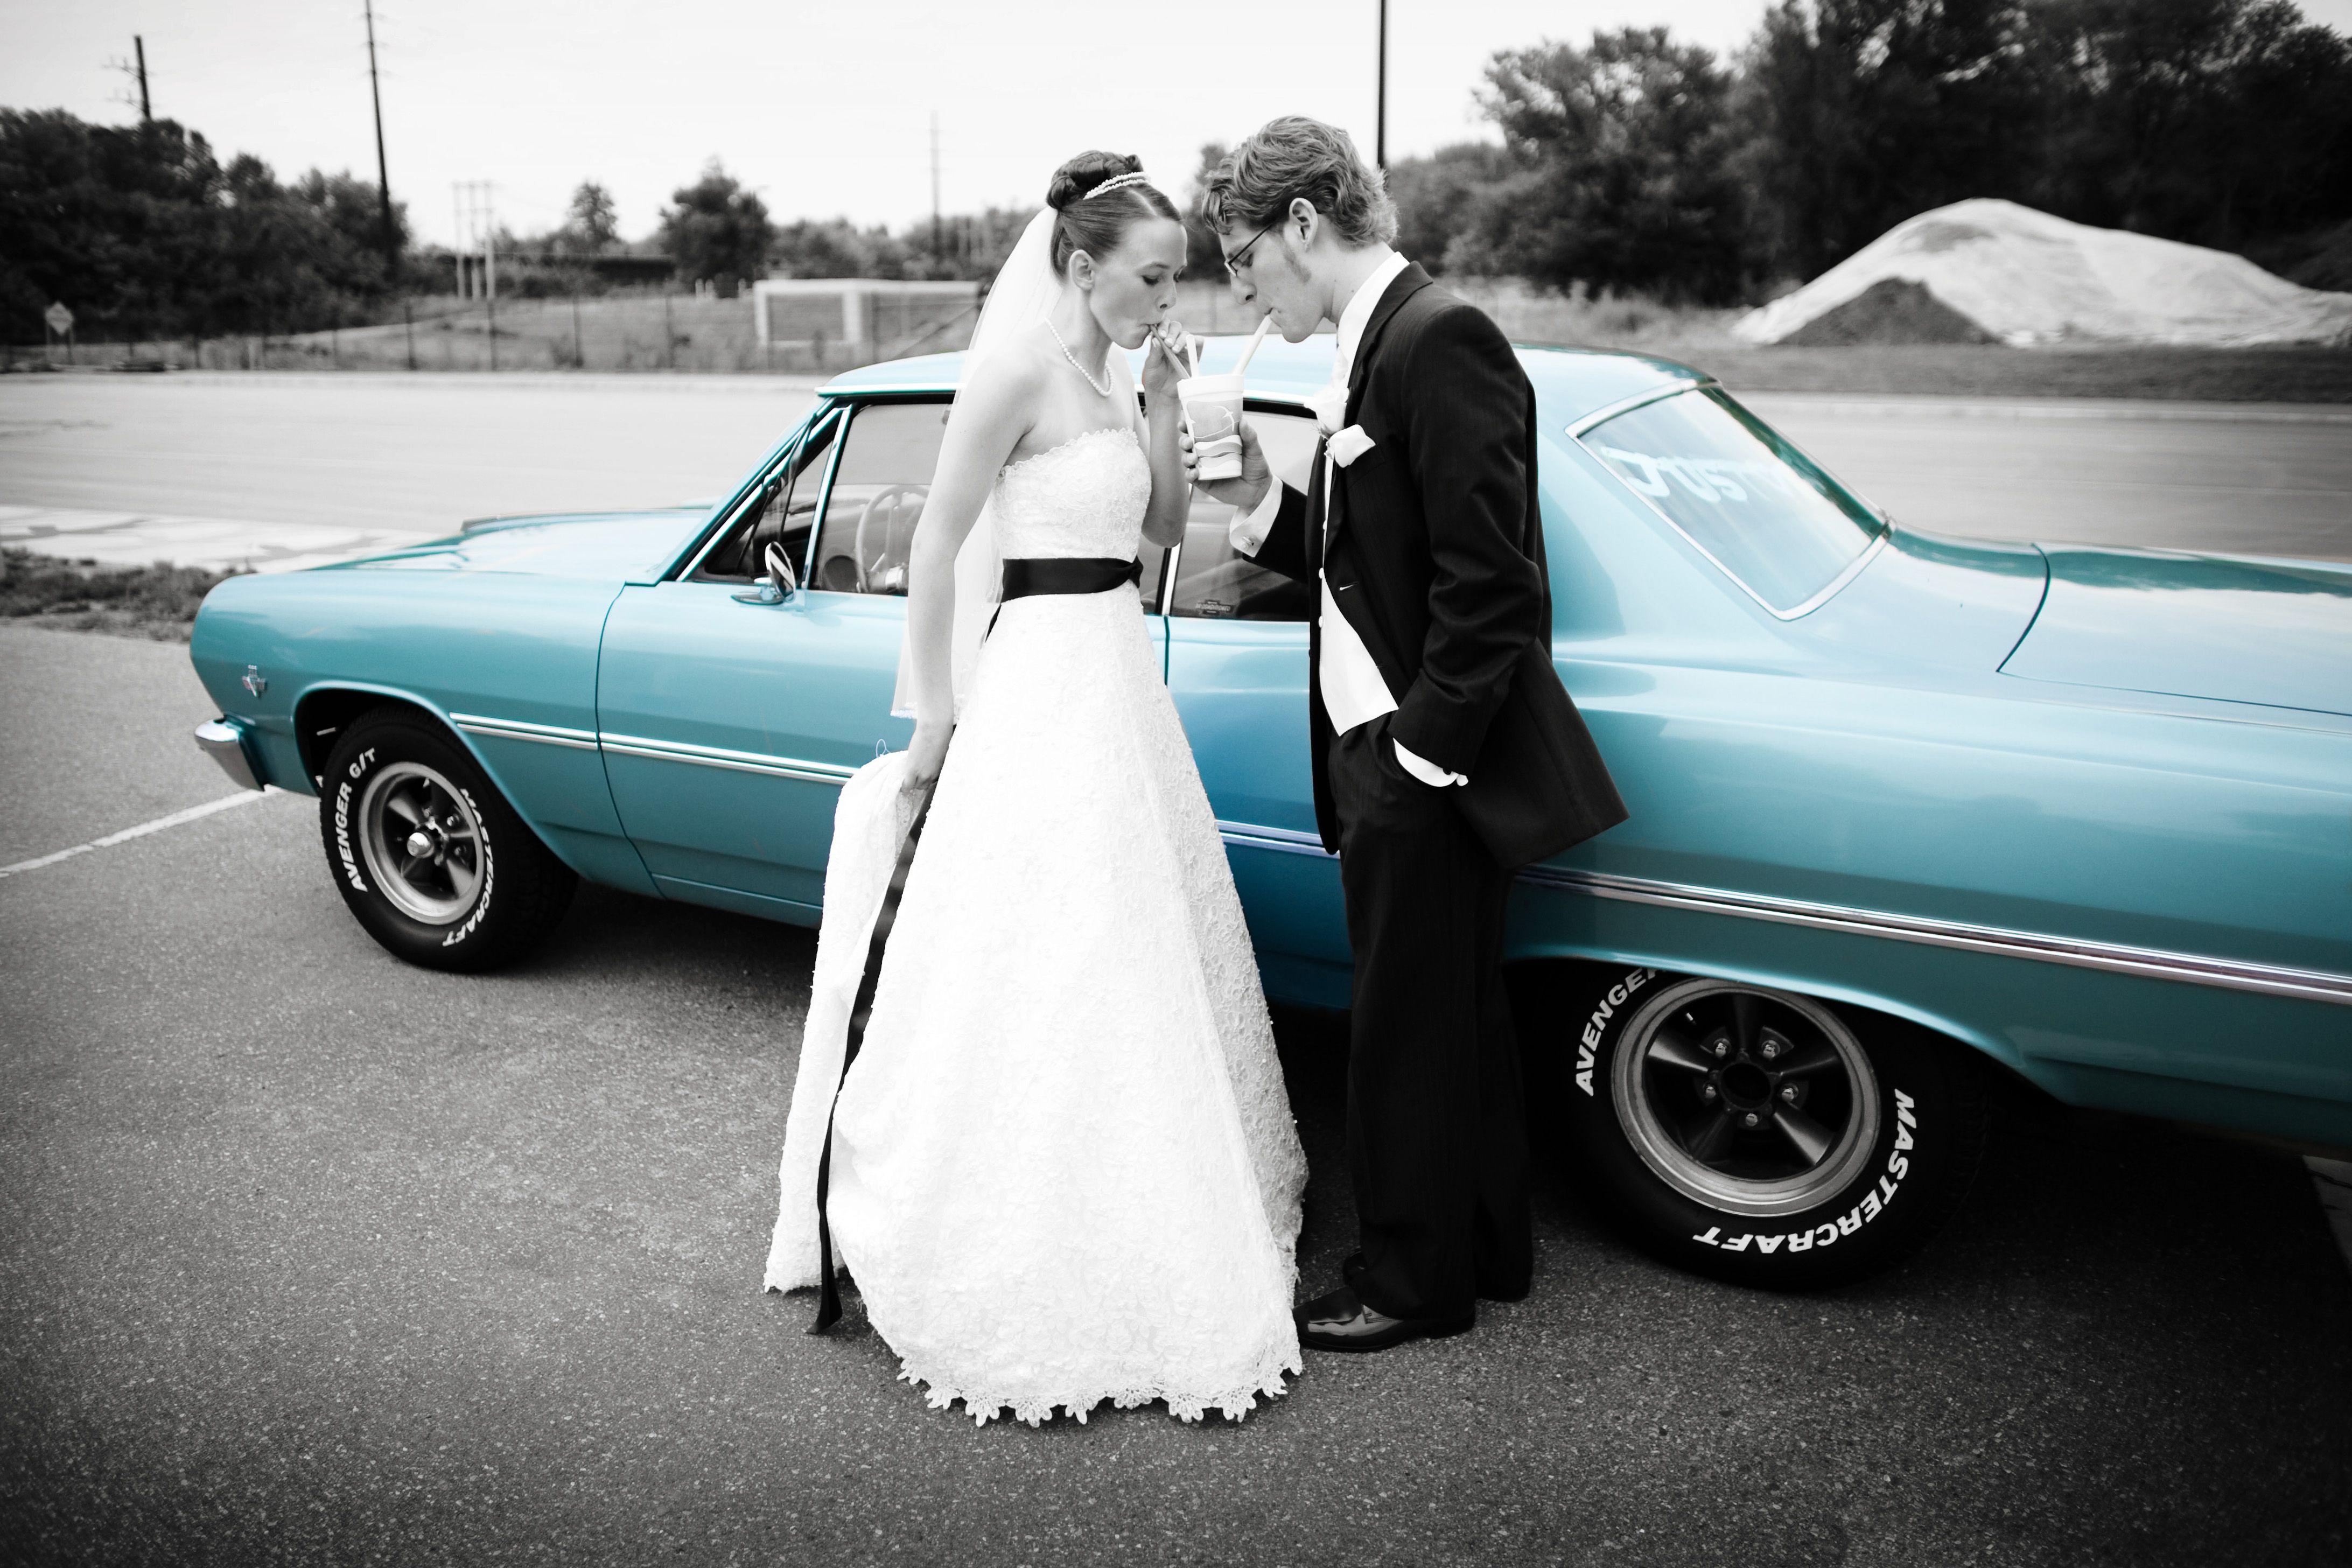 Omg!!! Just like nicks impala!!! Wedding transportation